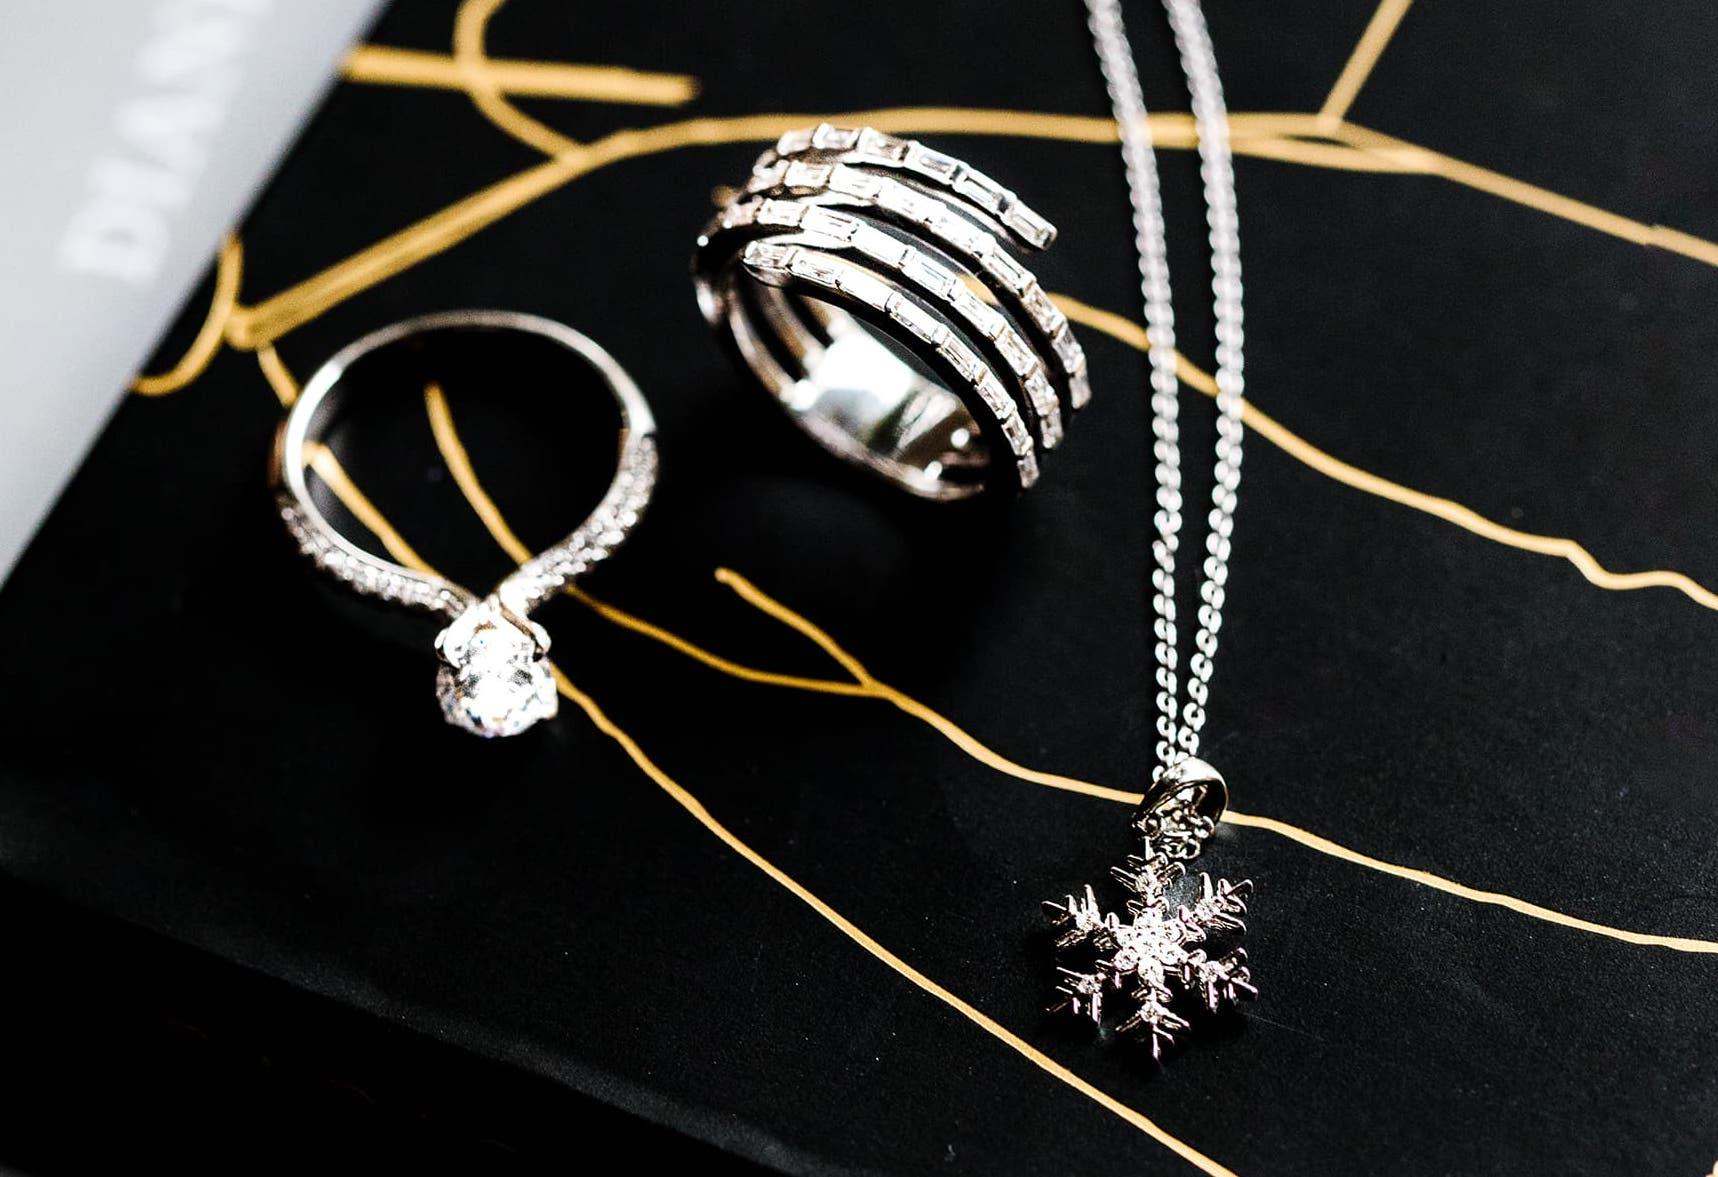 goop picks snowflake pendant oval engagement ring and diamond ring